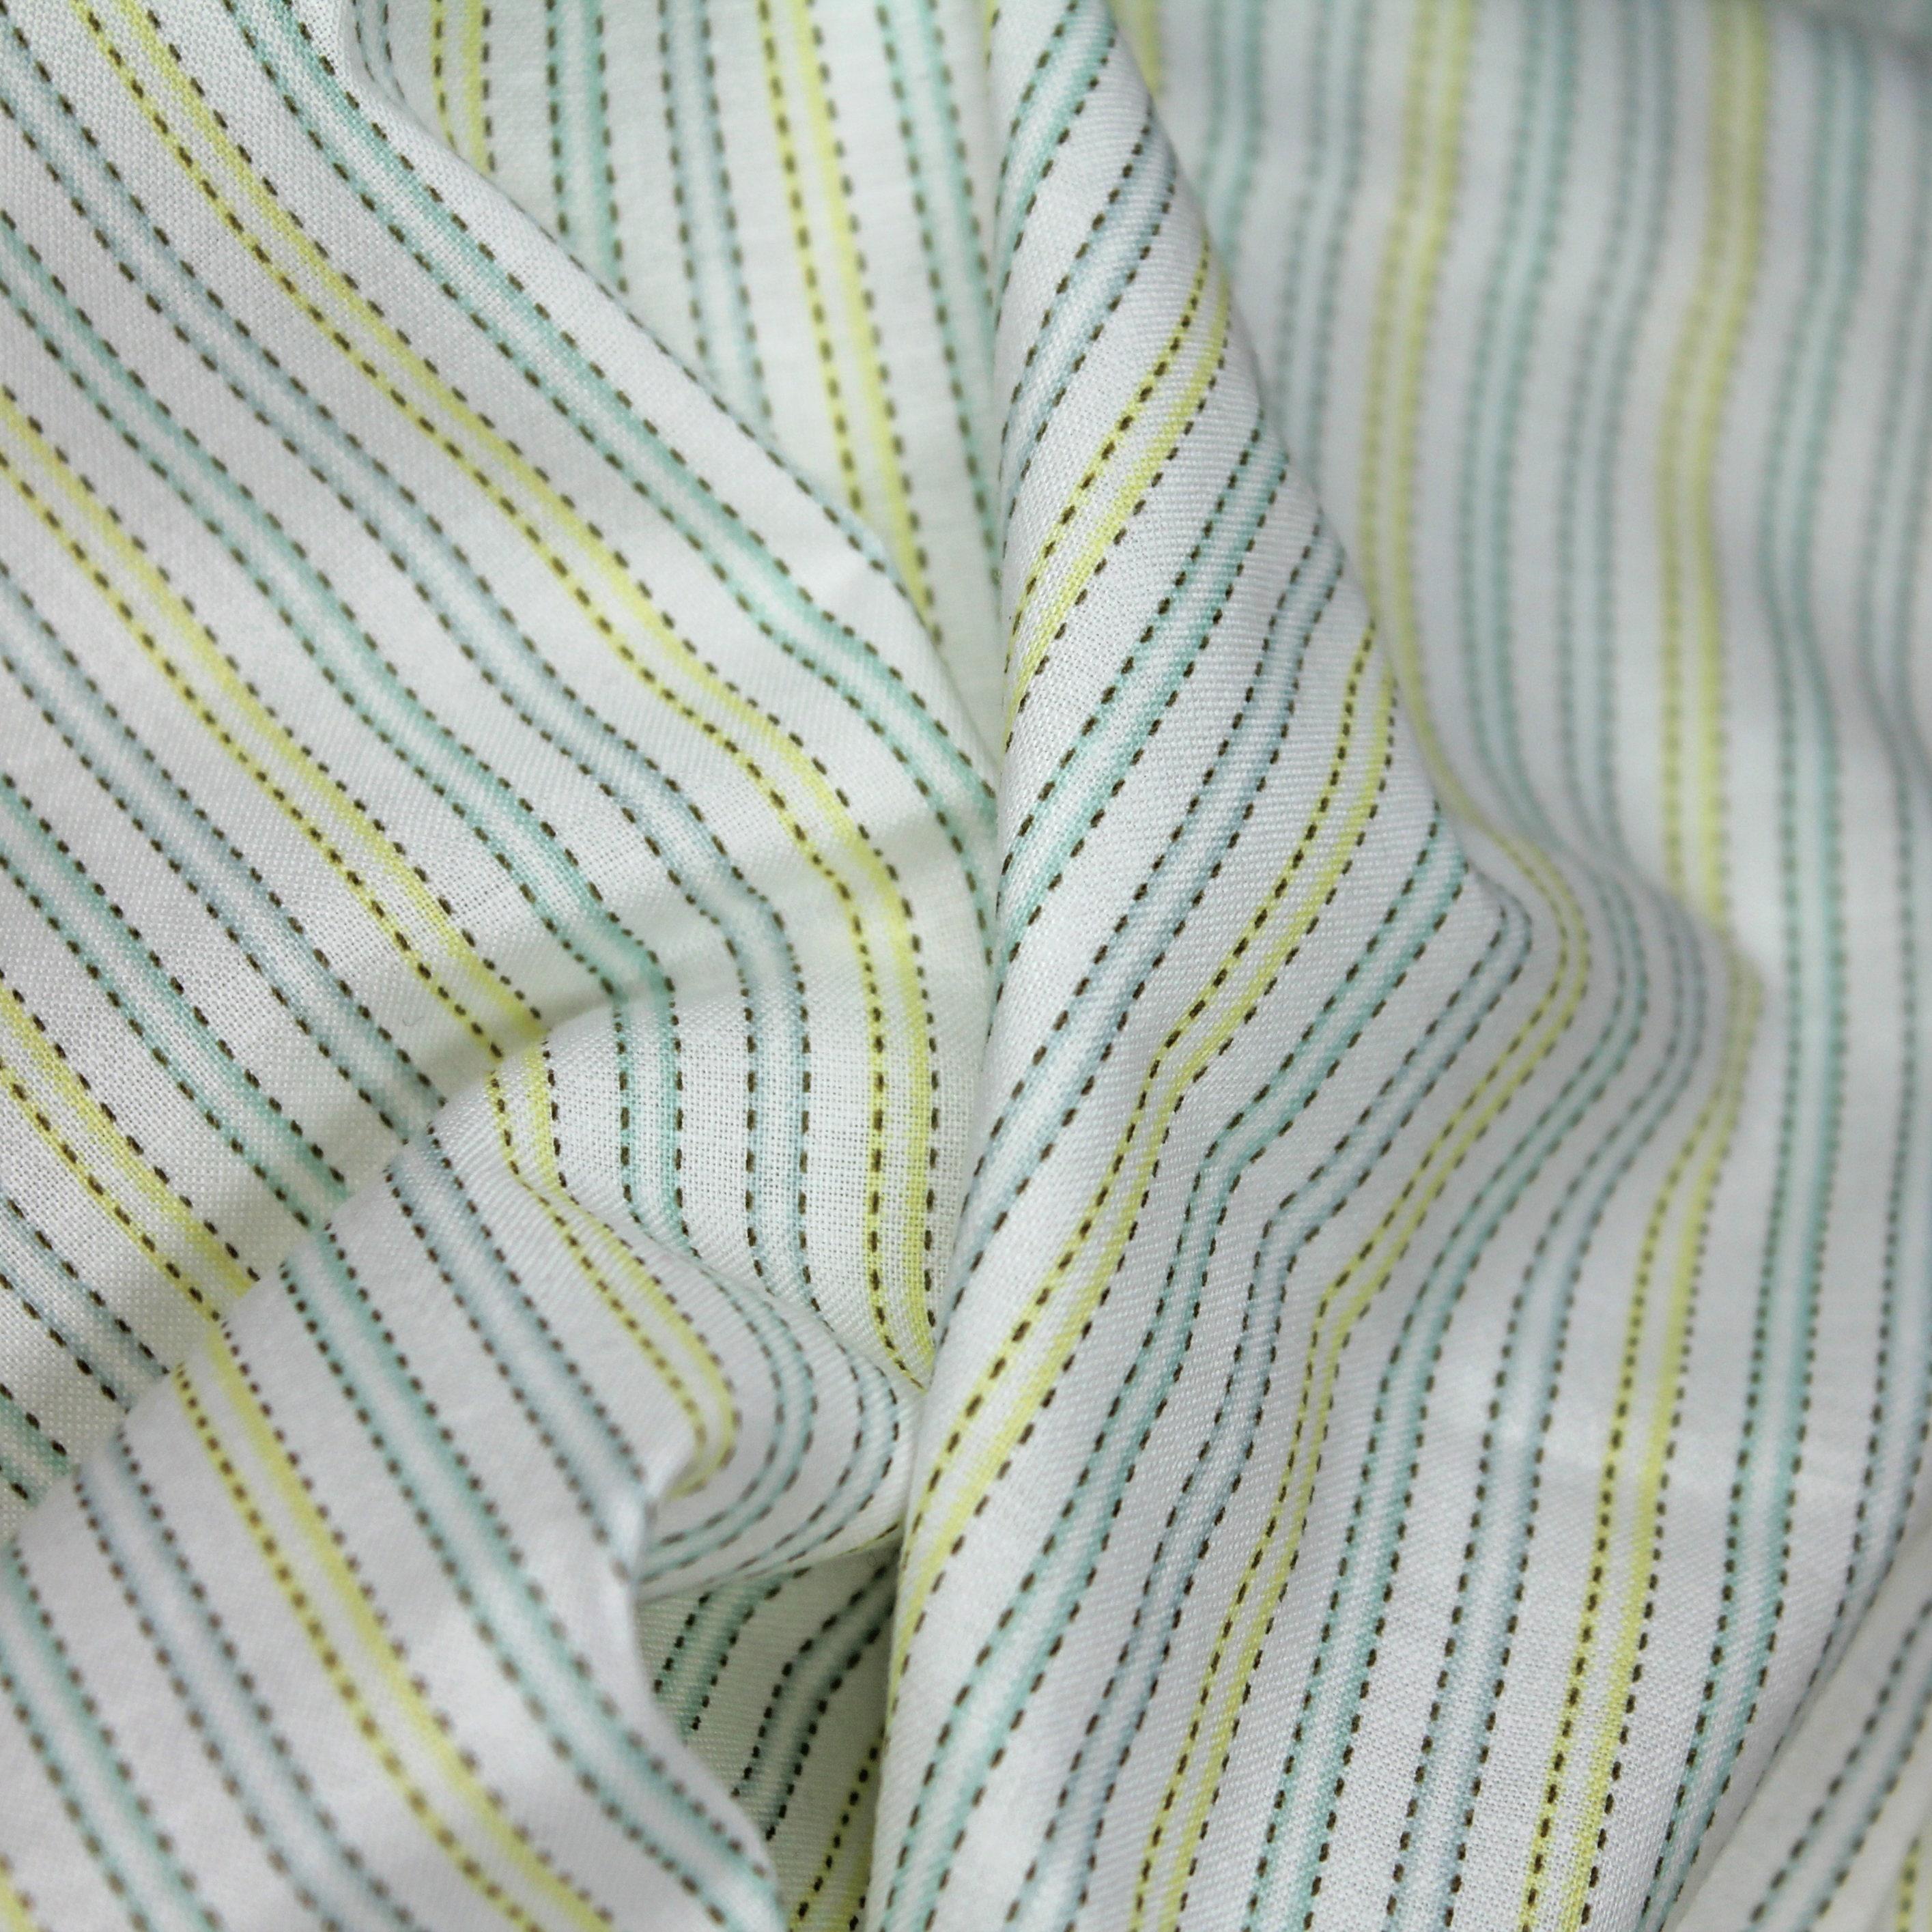 Stripe cotton fabric baby fabric nursery fabric yellow for Baby nursery fabric yard